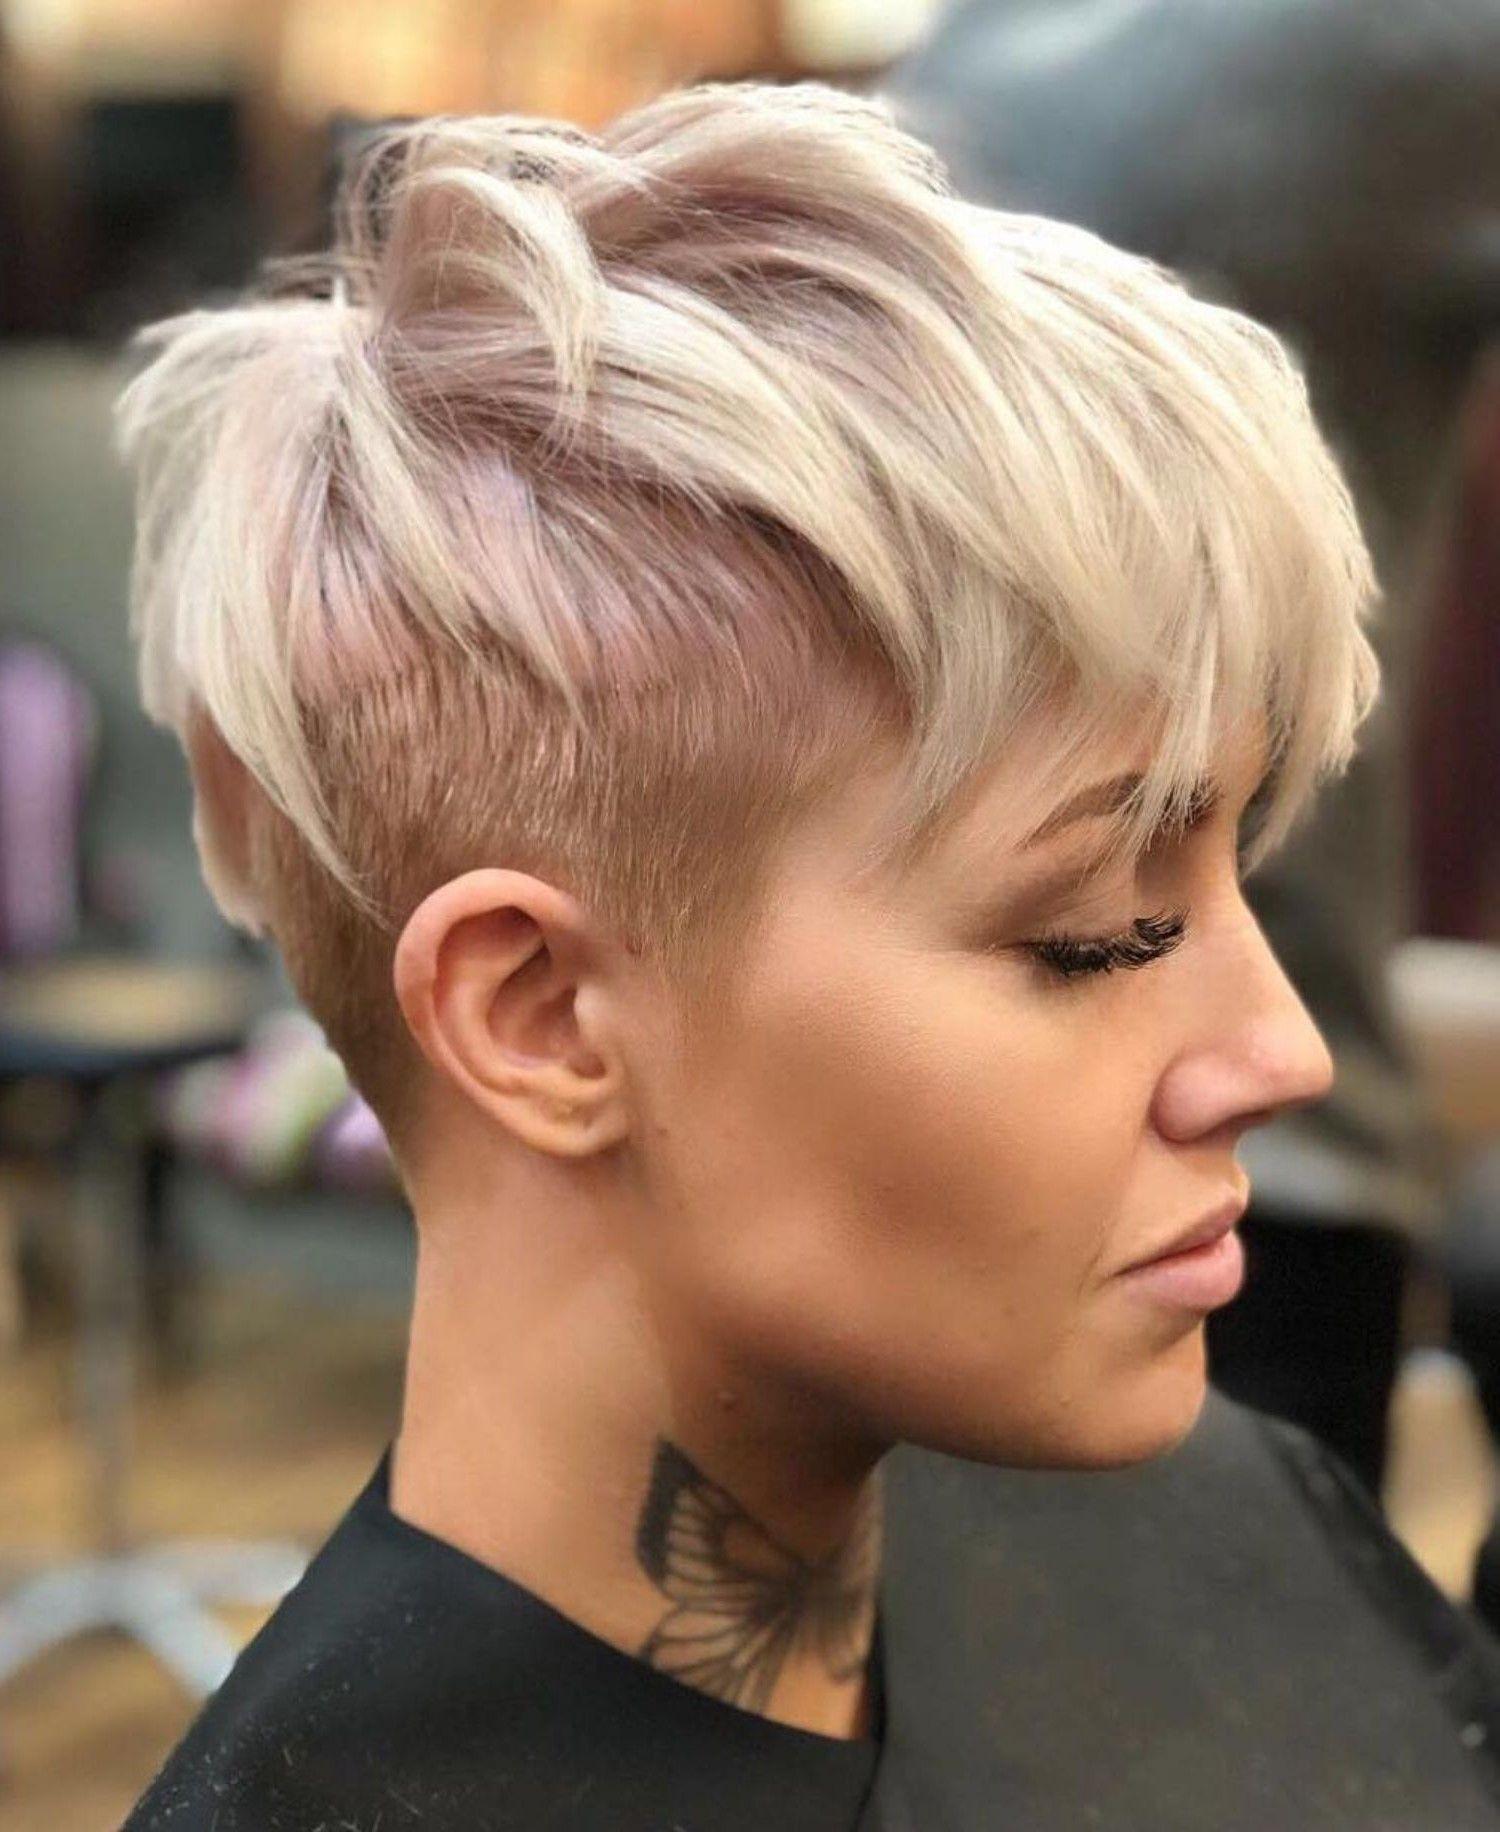 35+ Modele coiffure courte 2019 idees en 2021